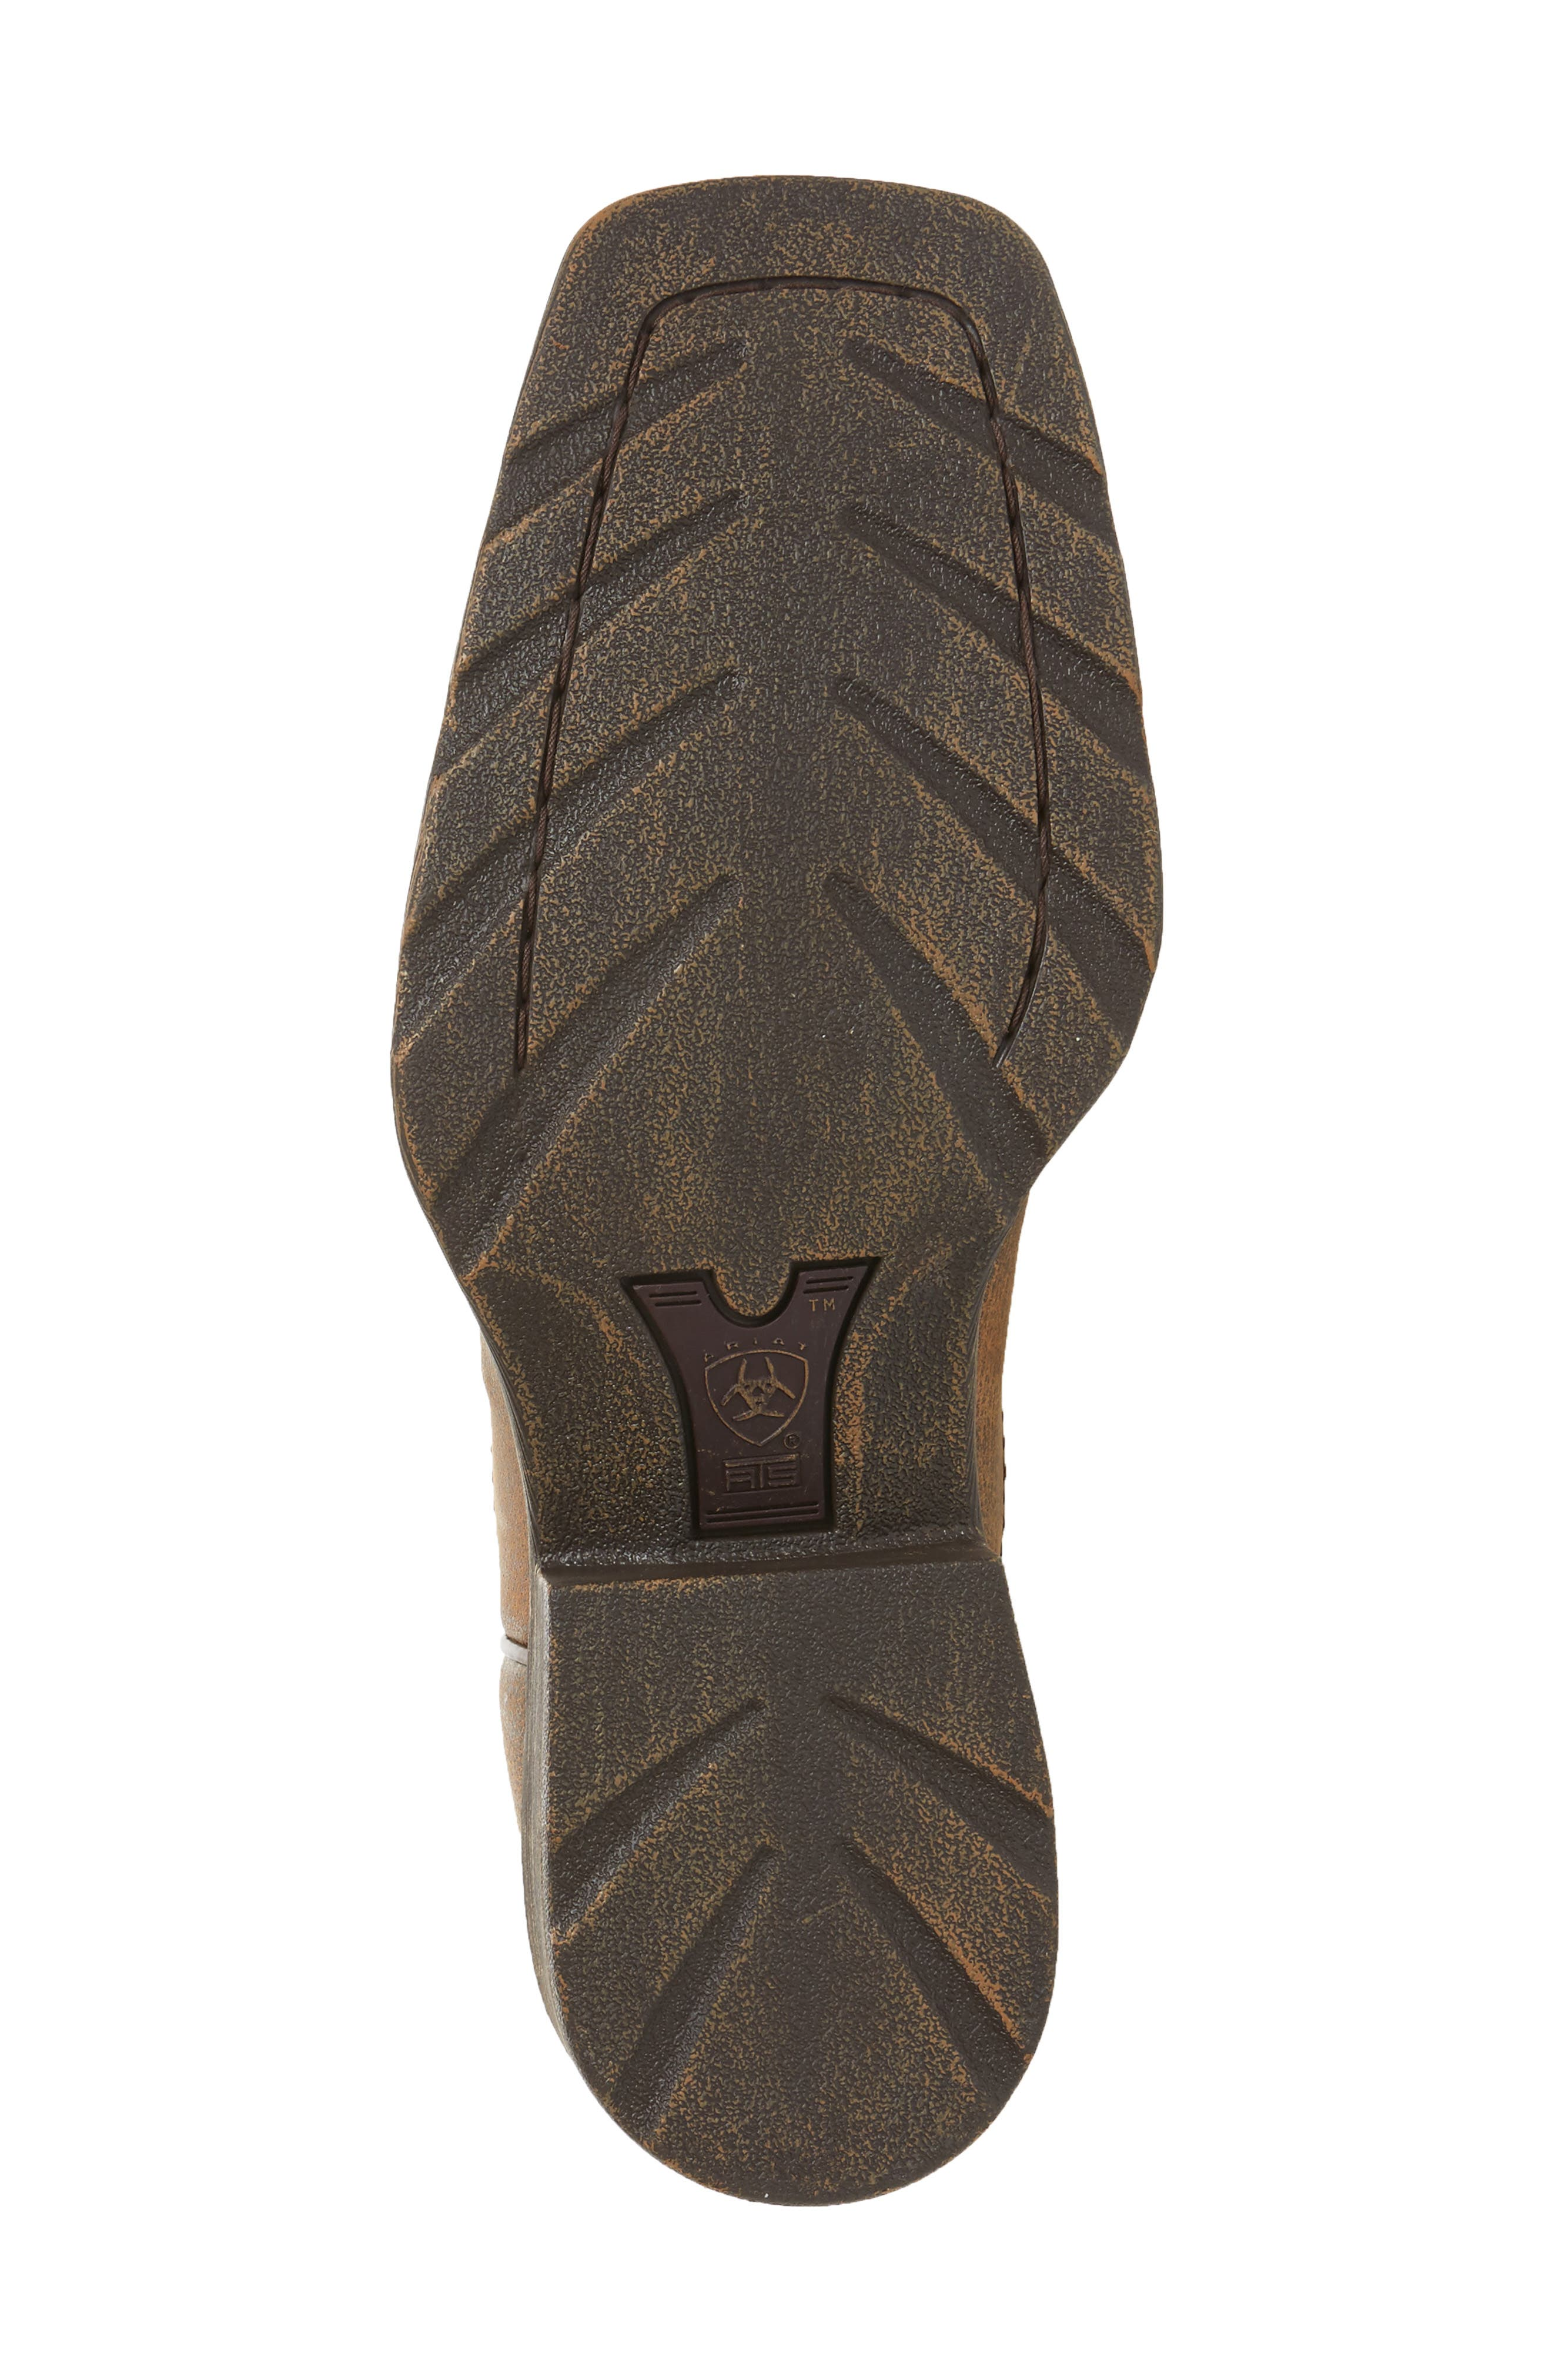 Western Rambler Cowboy Boot,                             Alternate thumbnail 6, color,                             Vintage Bomber Leather